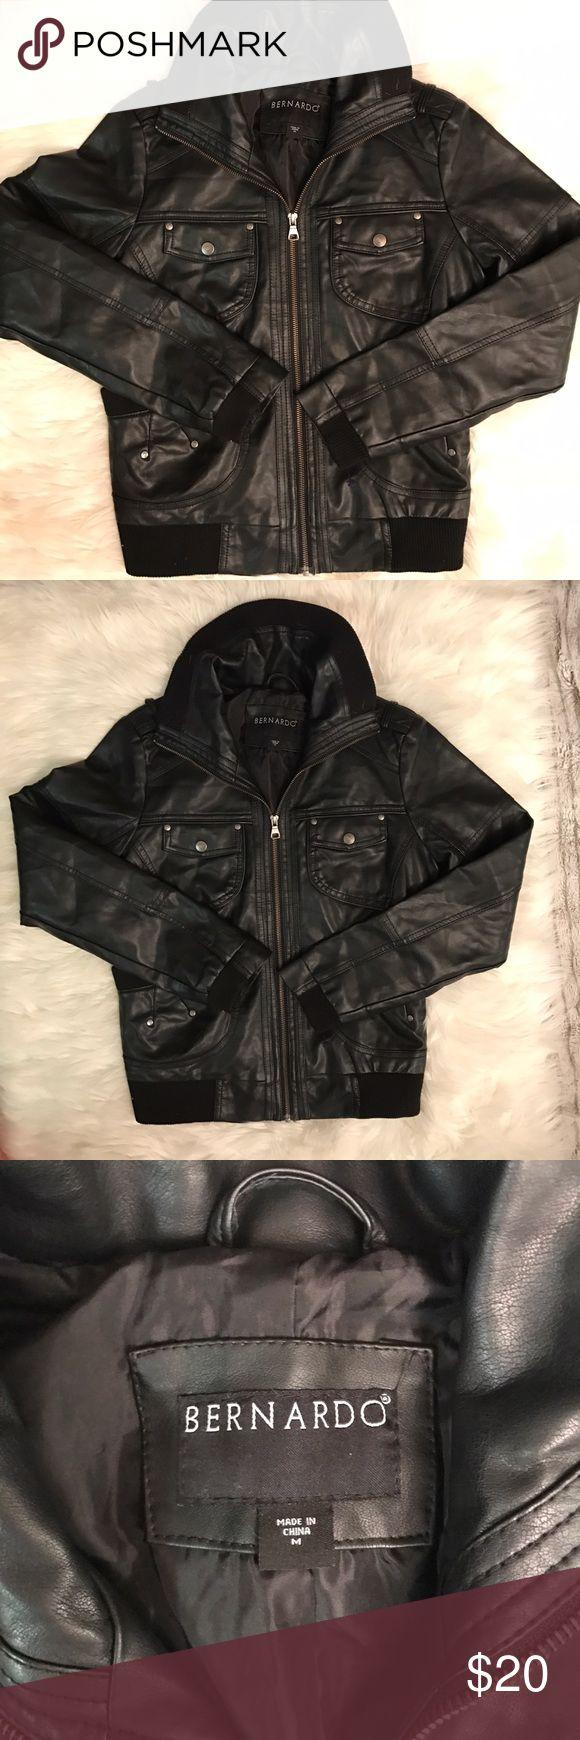 Black faux leather jacket Super cute black faux leather jacket. Perfect condition! Bernardo Jackets & Coats